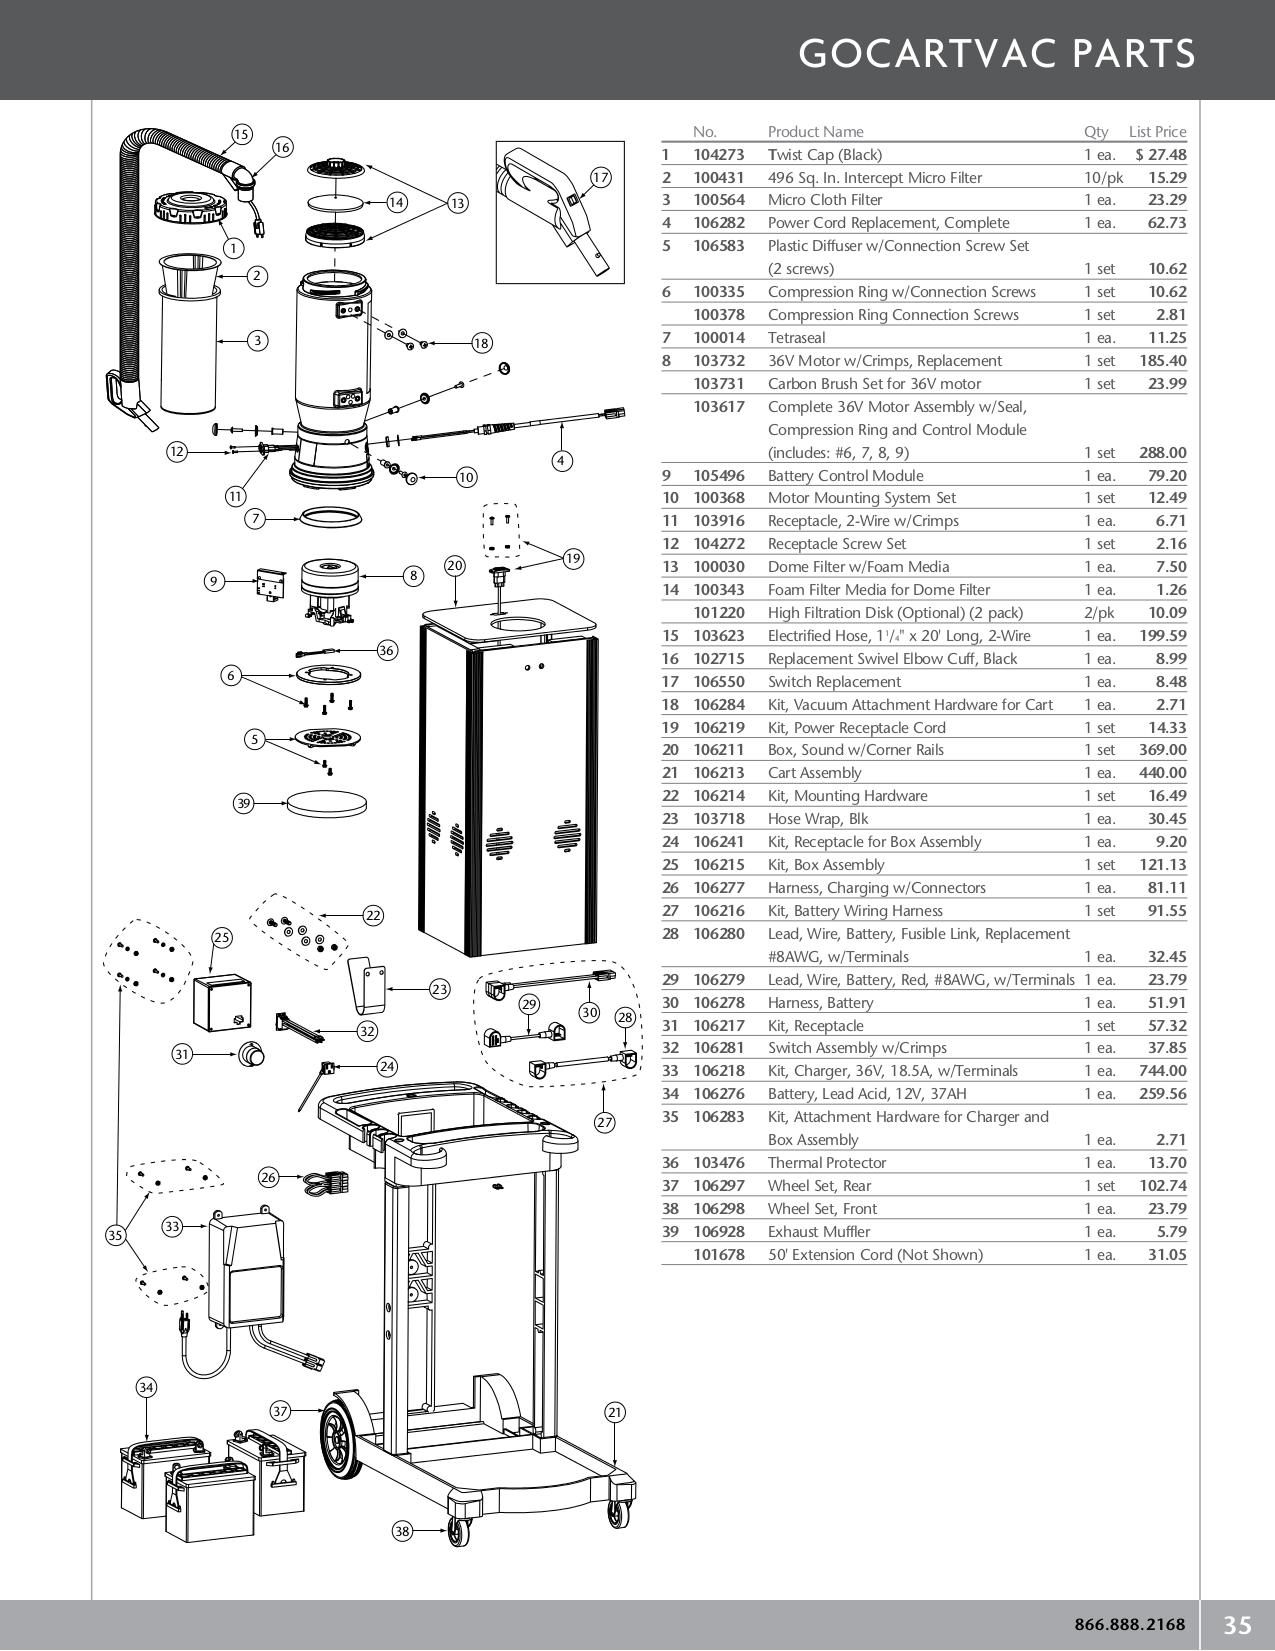 Pro team vacuum wiring diagram wiring diagram download free pdf for pro team gocartvac vacuum manual electrolux vacuum wiring diagram pdf for pro asfbconference2016 Choice Image